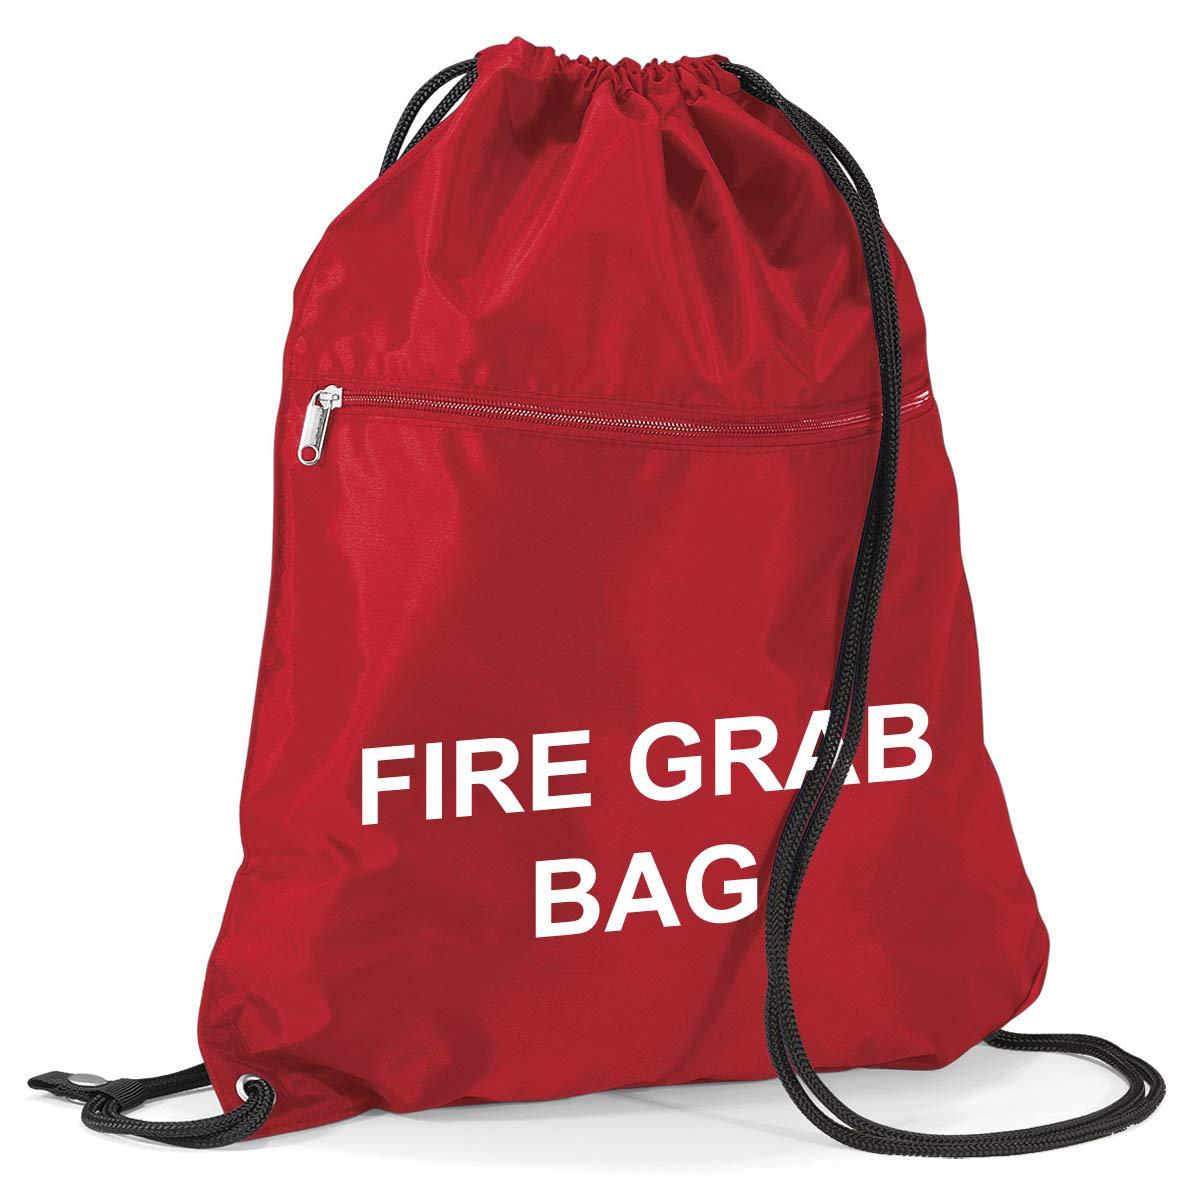 School Evacuation Fire Grab Bag - Printed Red Emergency Documents Drawstring Sack Bag